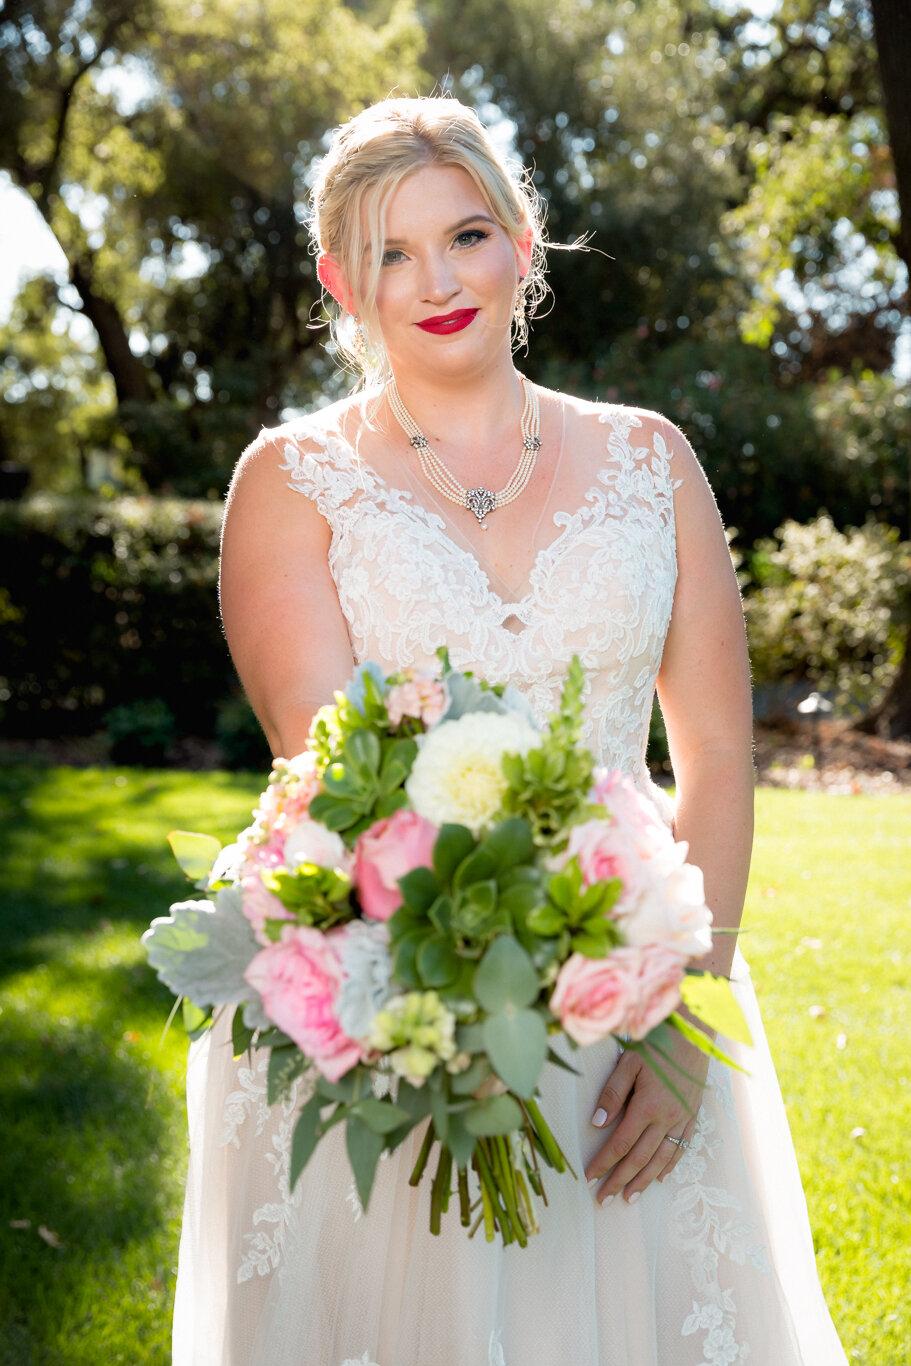 2019.08.24_Emily-Ashir-Wedding-at-the-Maples-5681.jpg